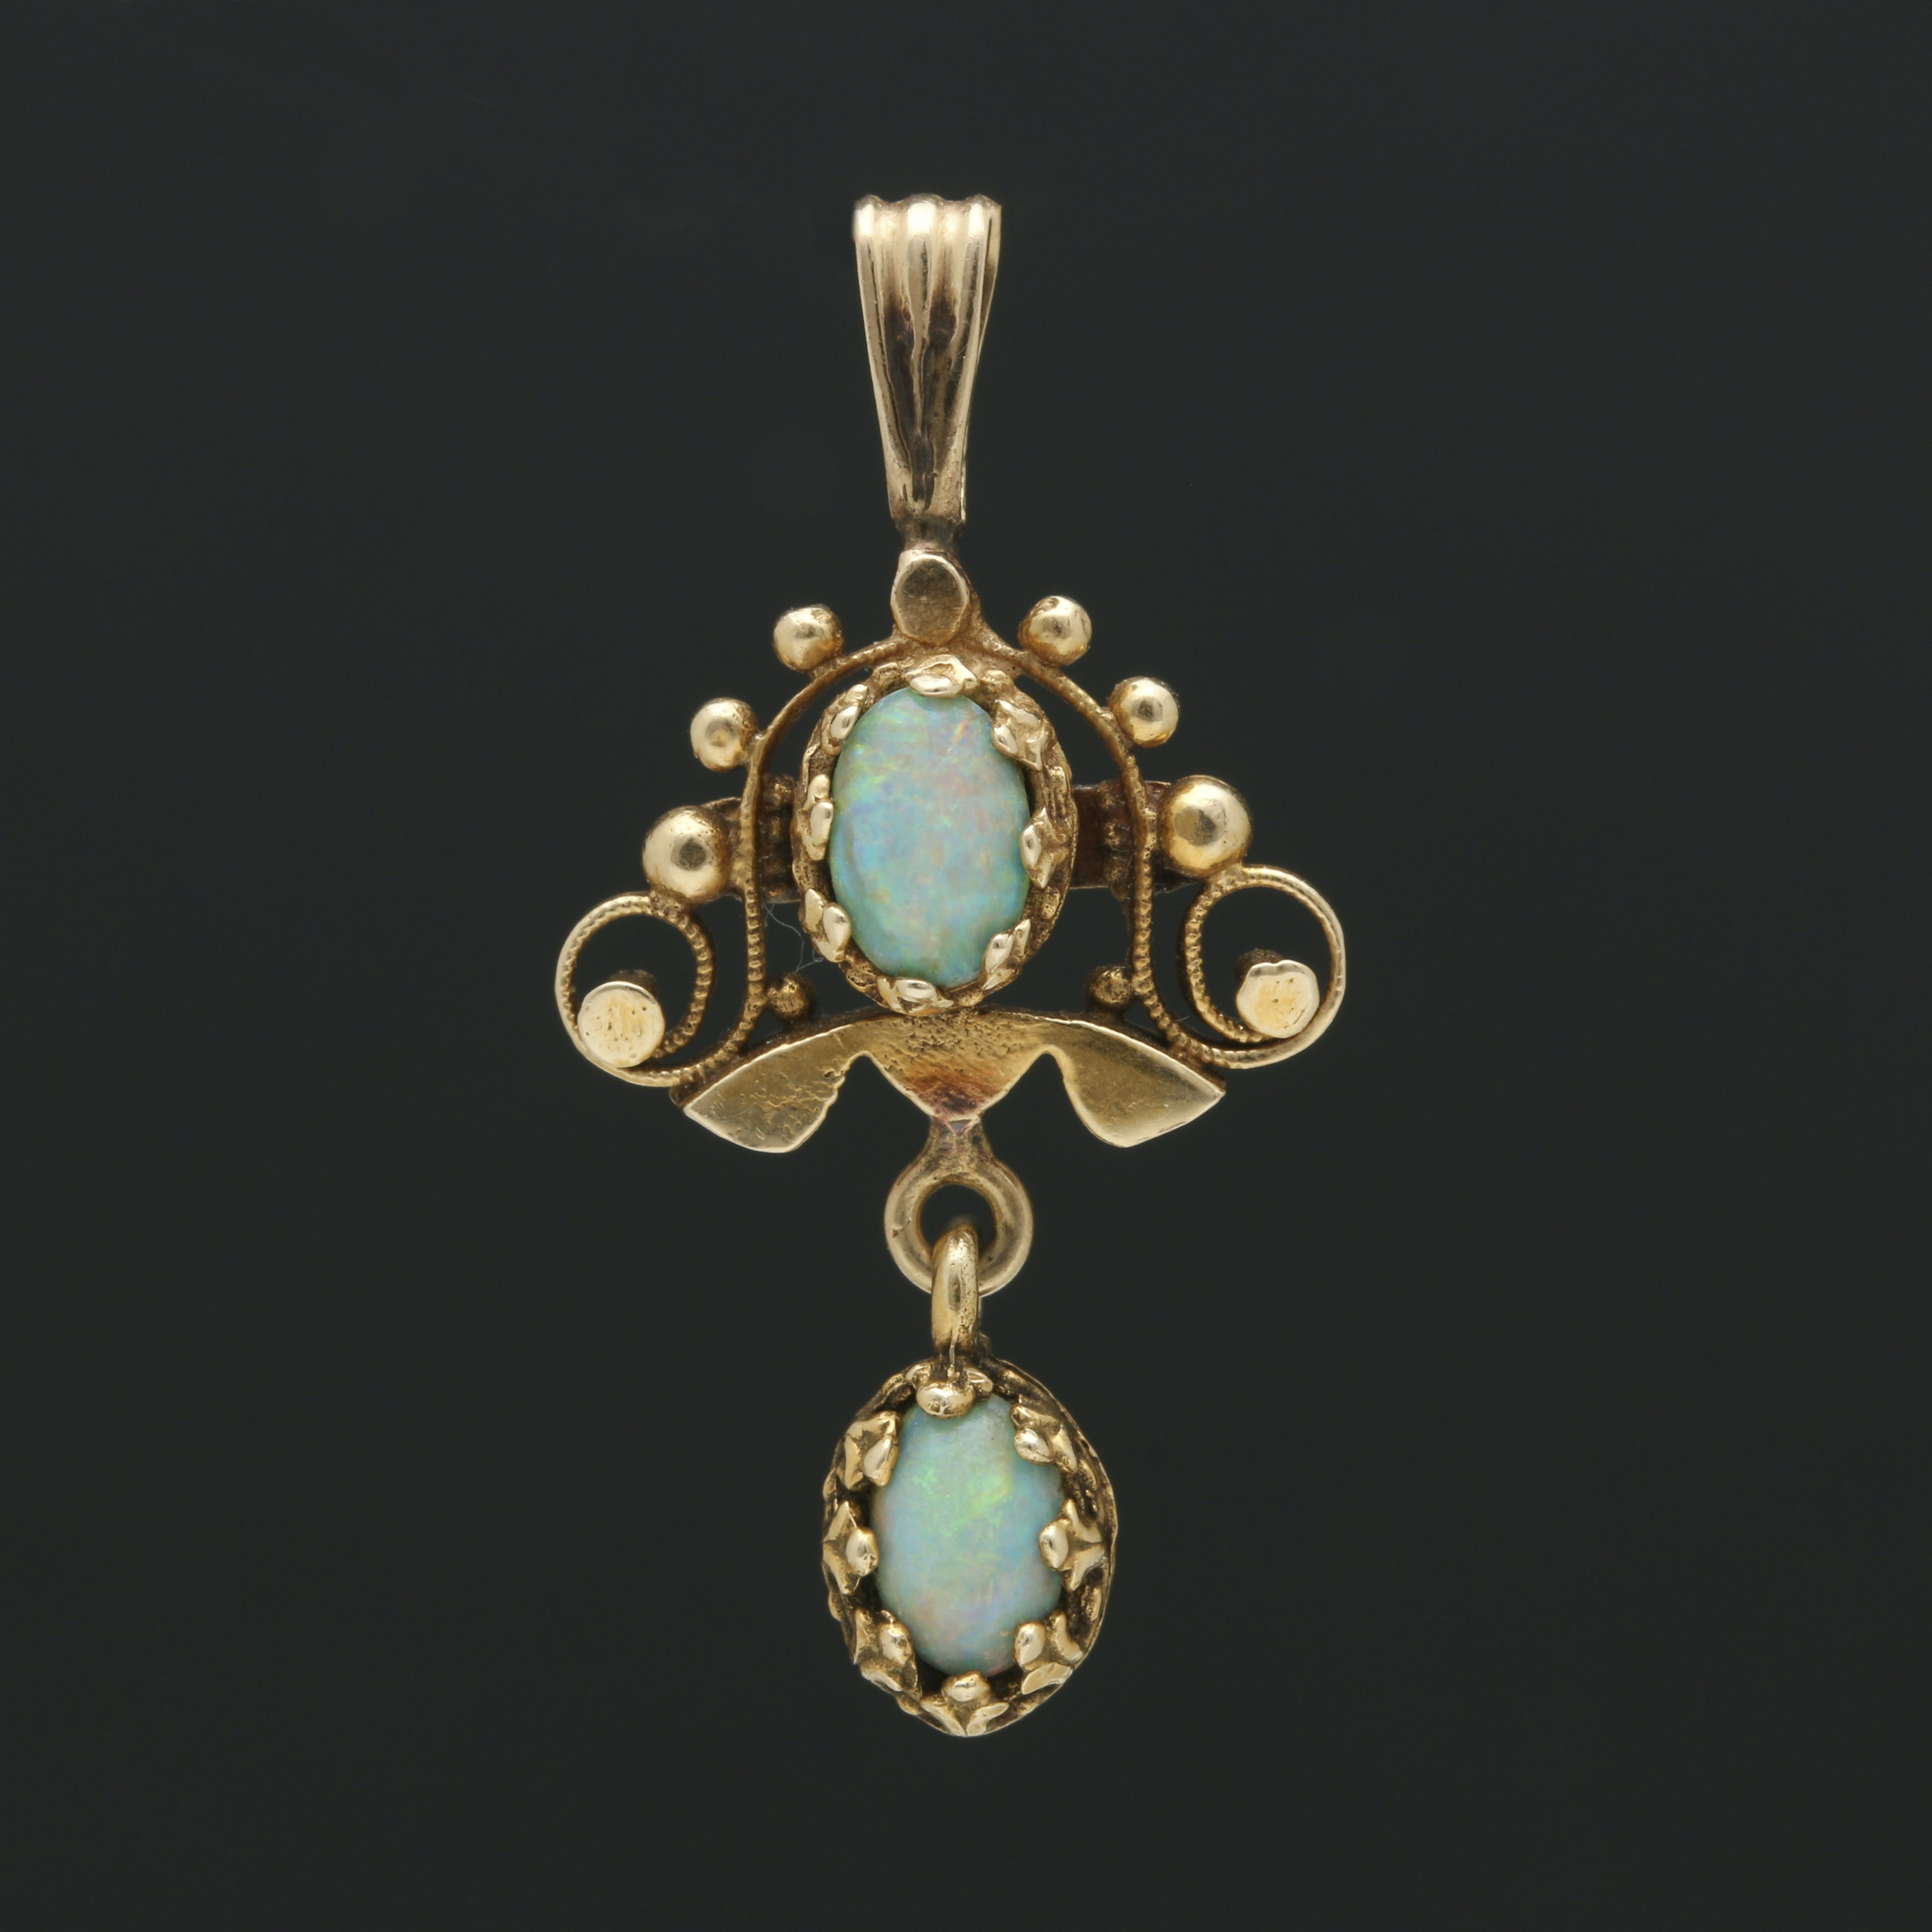 Victorian 14K Yellow Gold Opal Doublet Pendant